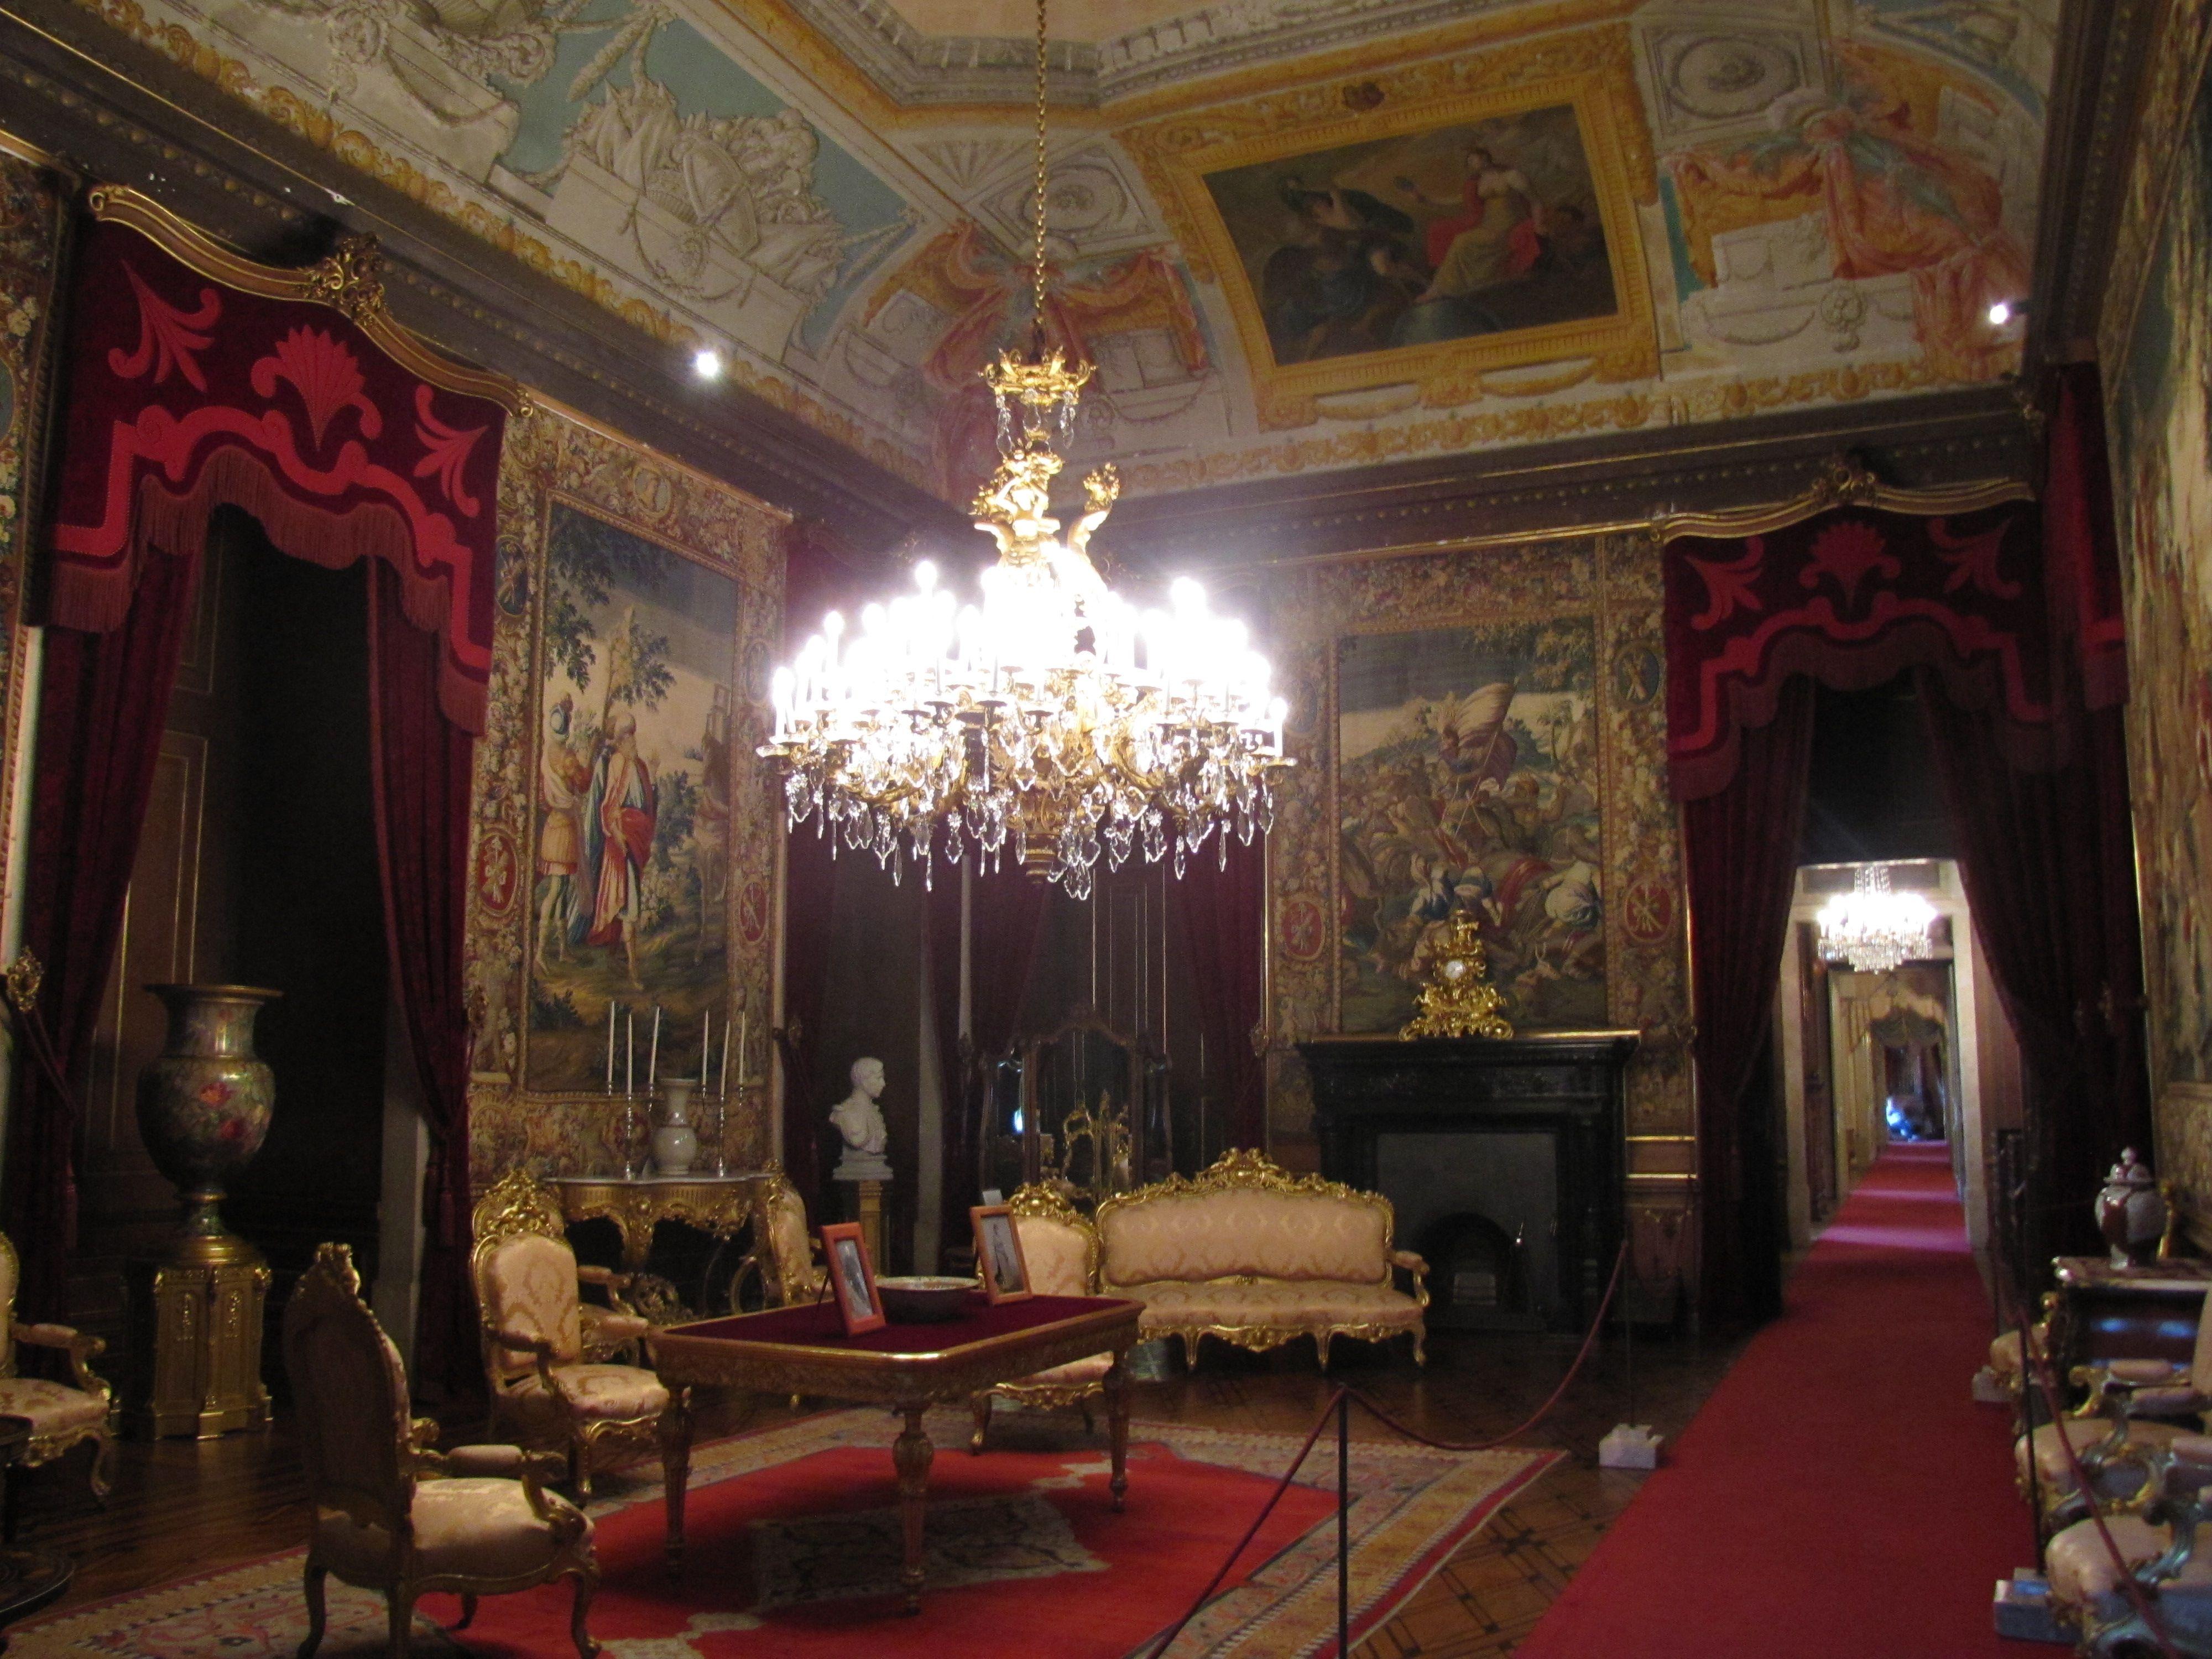 Palacio_Ajuda_-_Grande_Sala_de_Despacho.jpg (4000×3000) Belem, Lisboa, Portugal